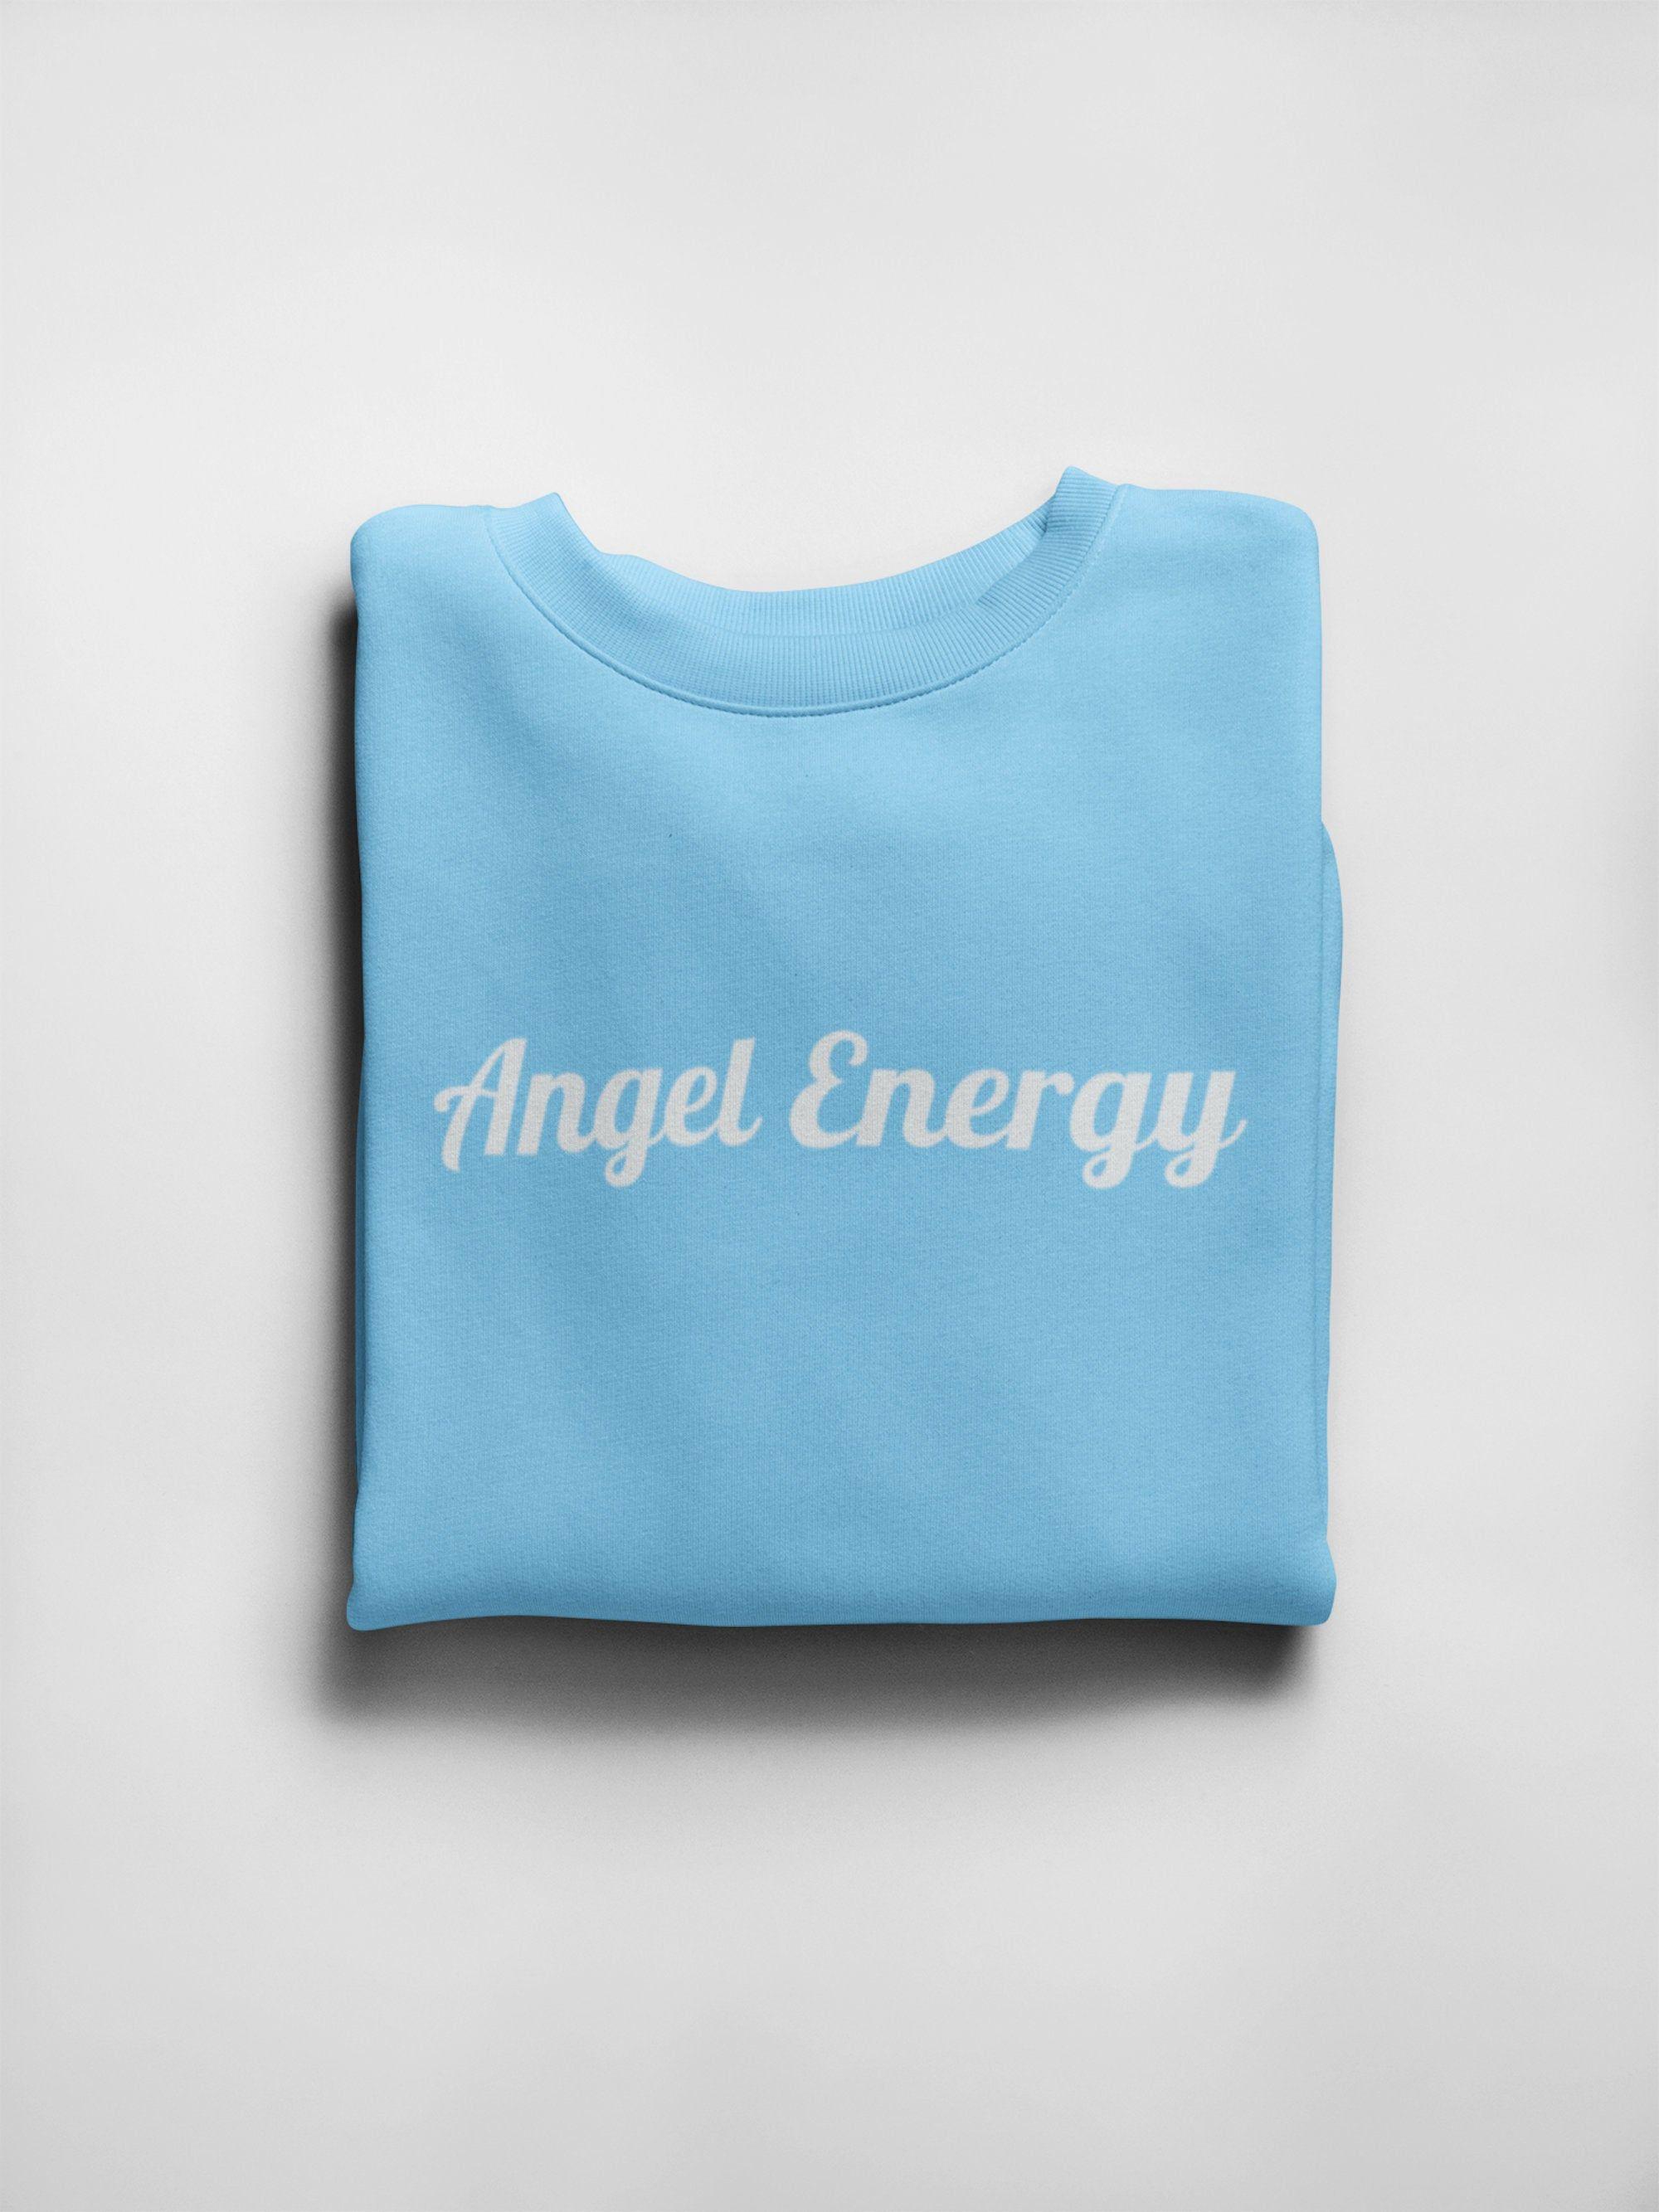 Angel Energy Unisex Crewneck Sweatshirt White Font Crew Neck Sweatshirt White Sweatshirt Sweatshirts [ 2667 x 2000 Pixel ]